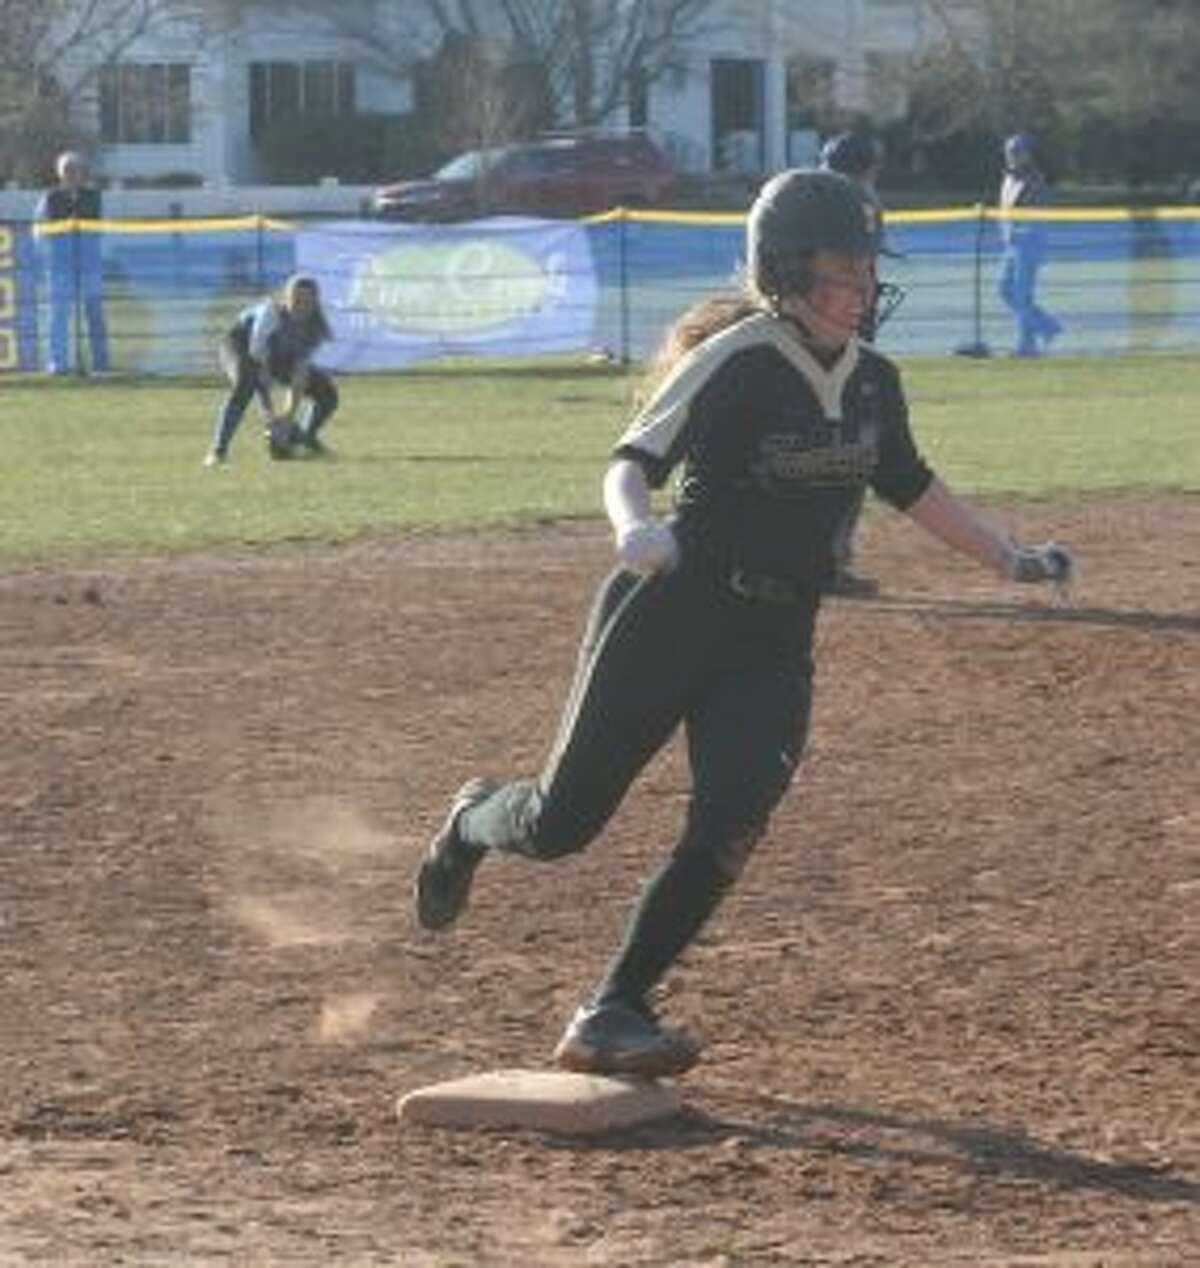 Courtney Fairfield rounds third base, as Ludlowe center fielder Madeline Reyes fields the ball.